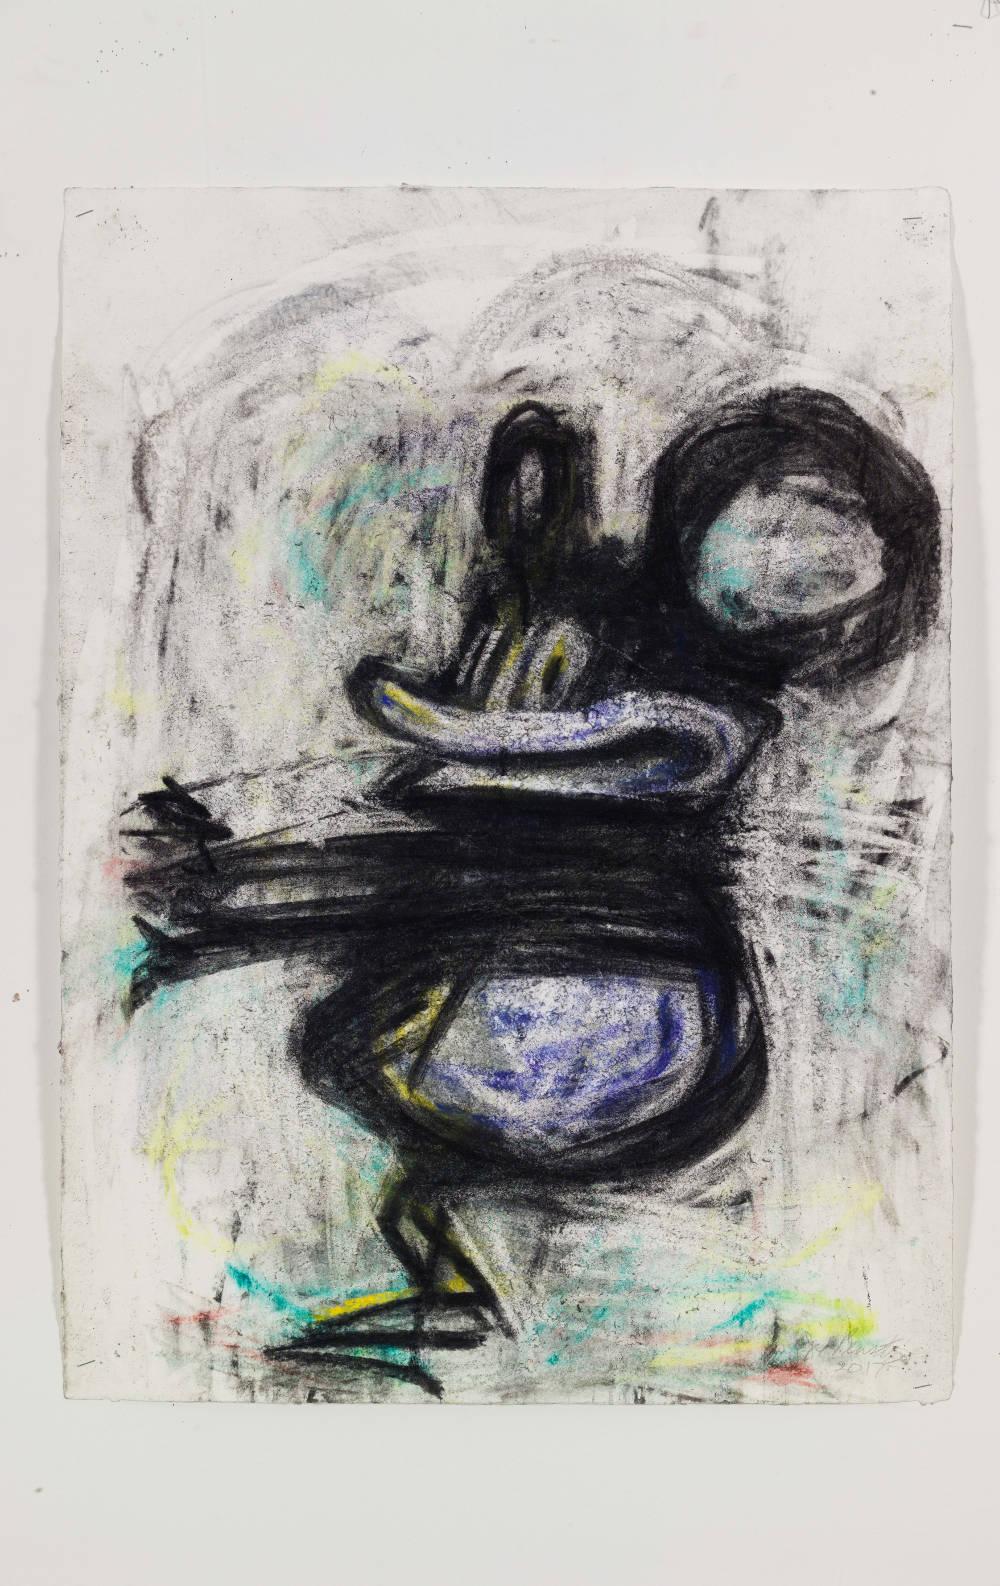 Joyce Pensato, Rhumba Mickey, 2017 © Joyce Pensato; Courtesy Lisson Gallery